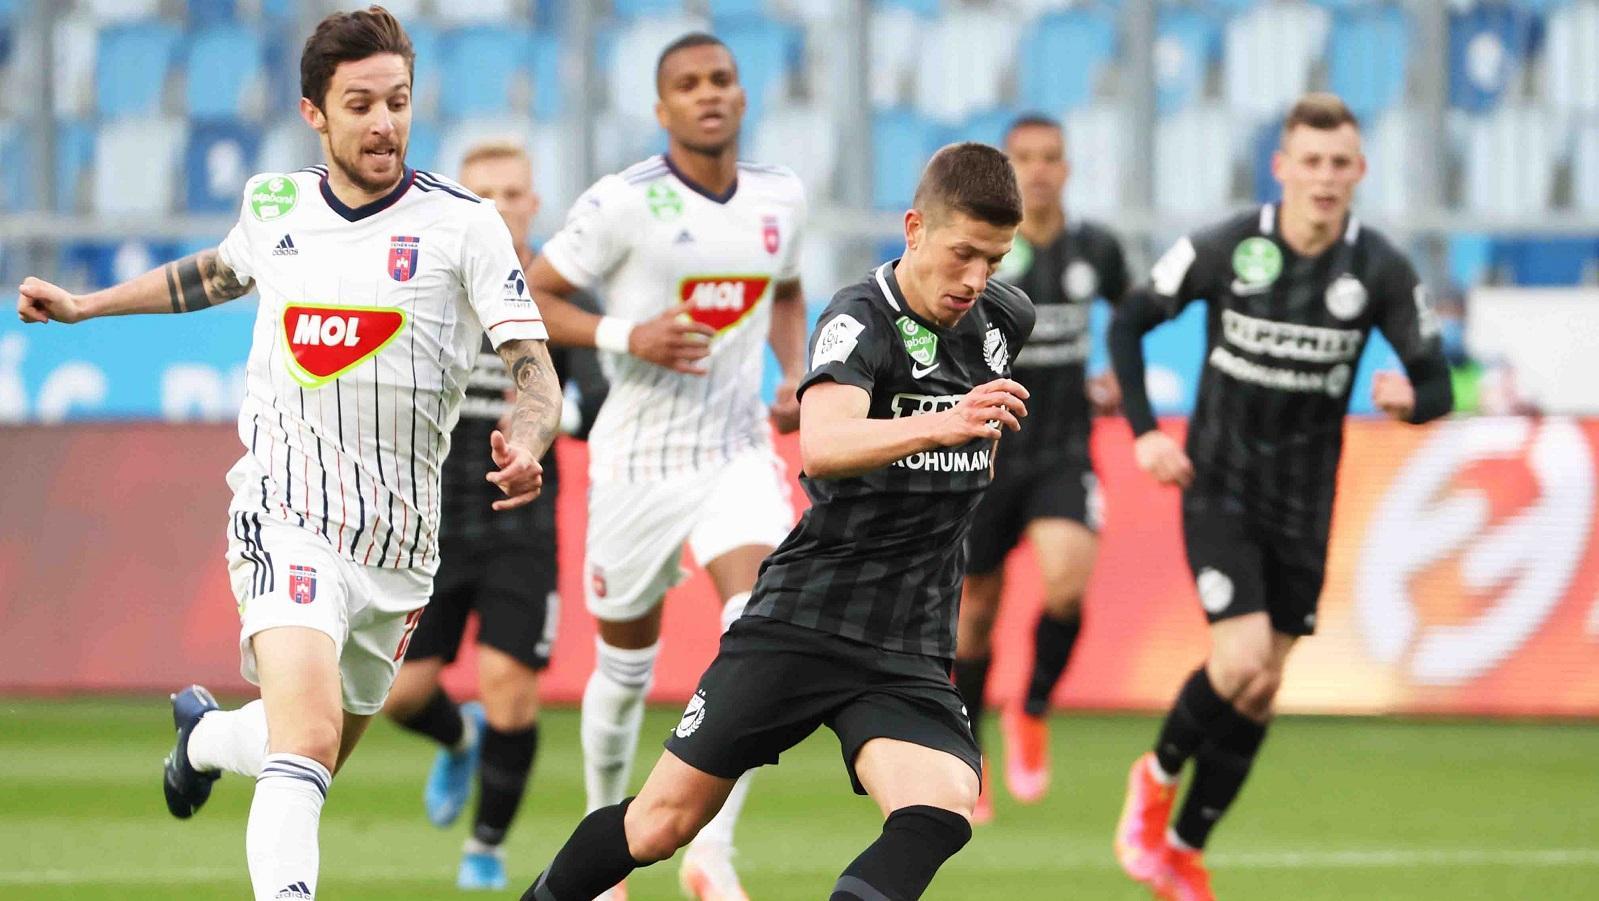 Képgaléria: MTK Budapest - MOL Fehérvár FC 1-2 (1-1)